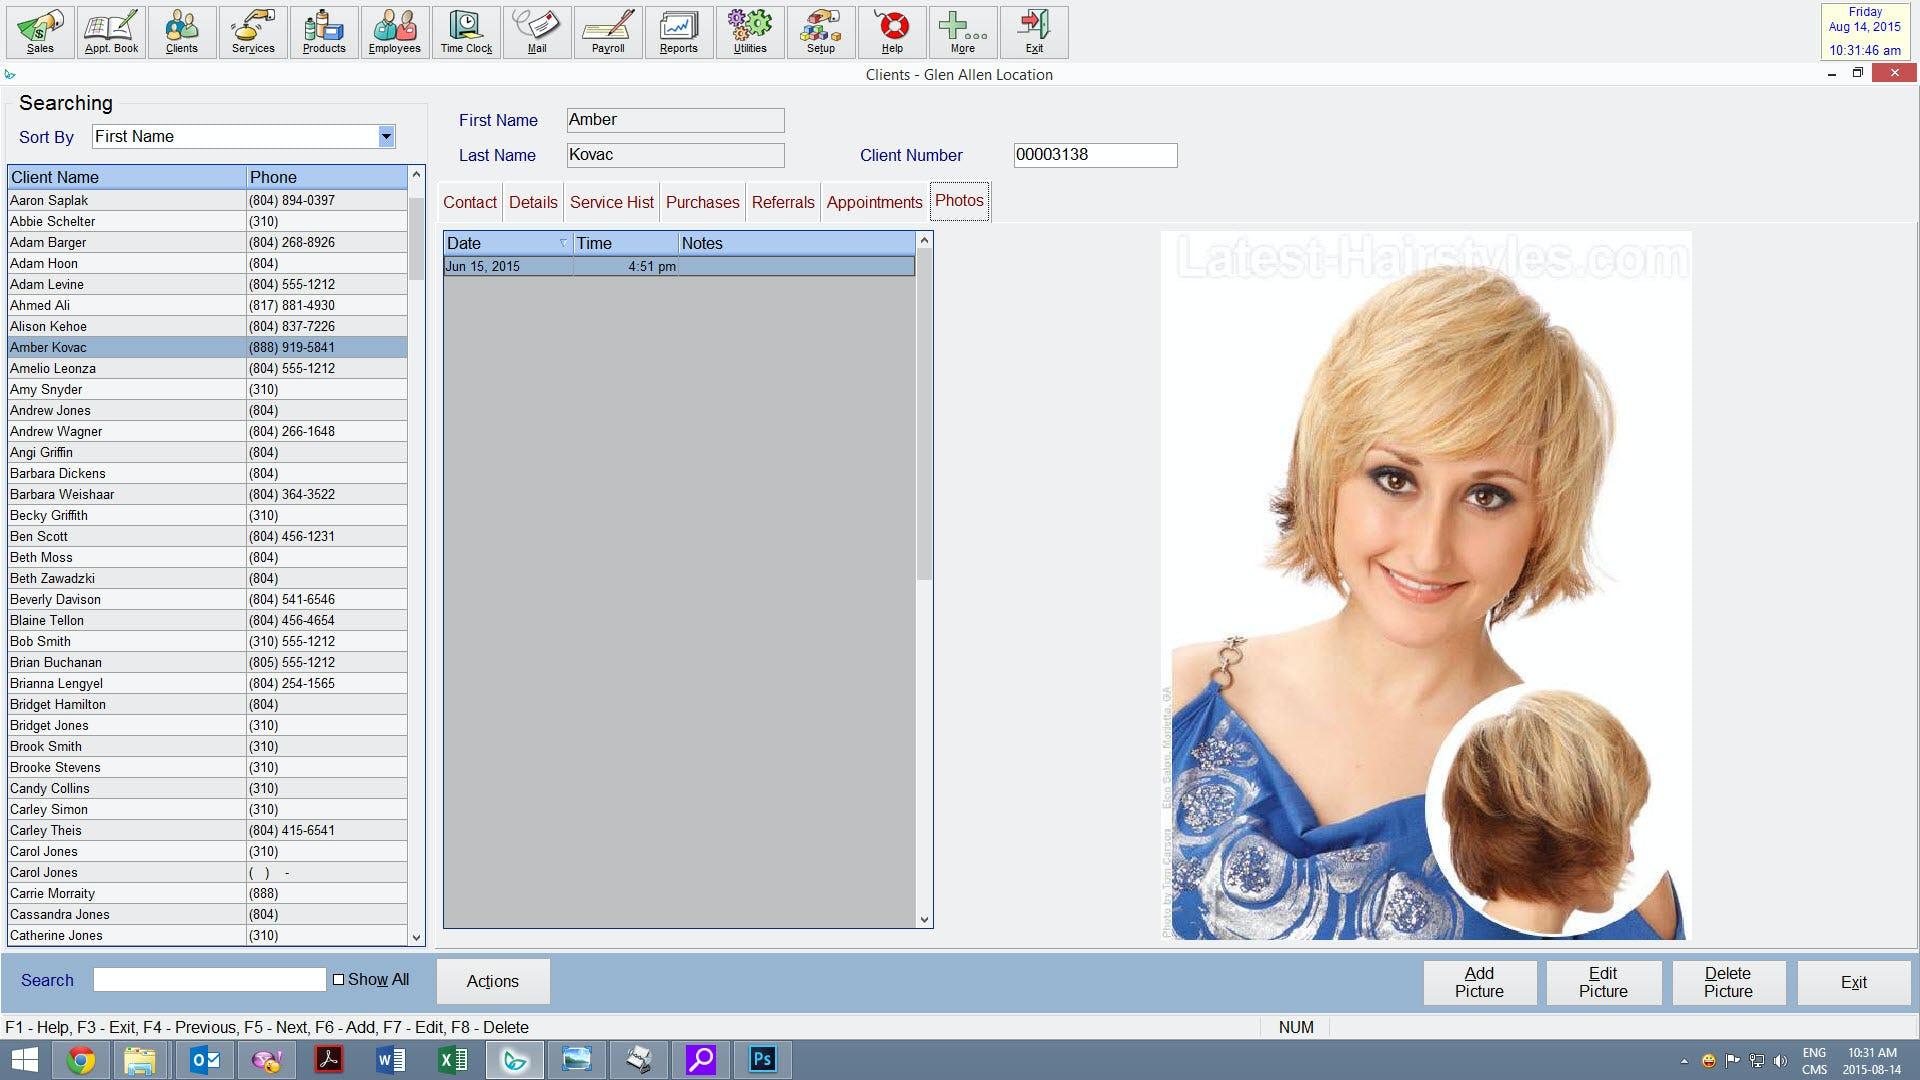 Insight Software - Customer management